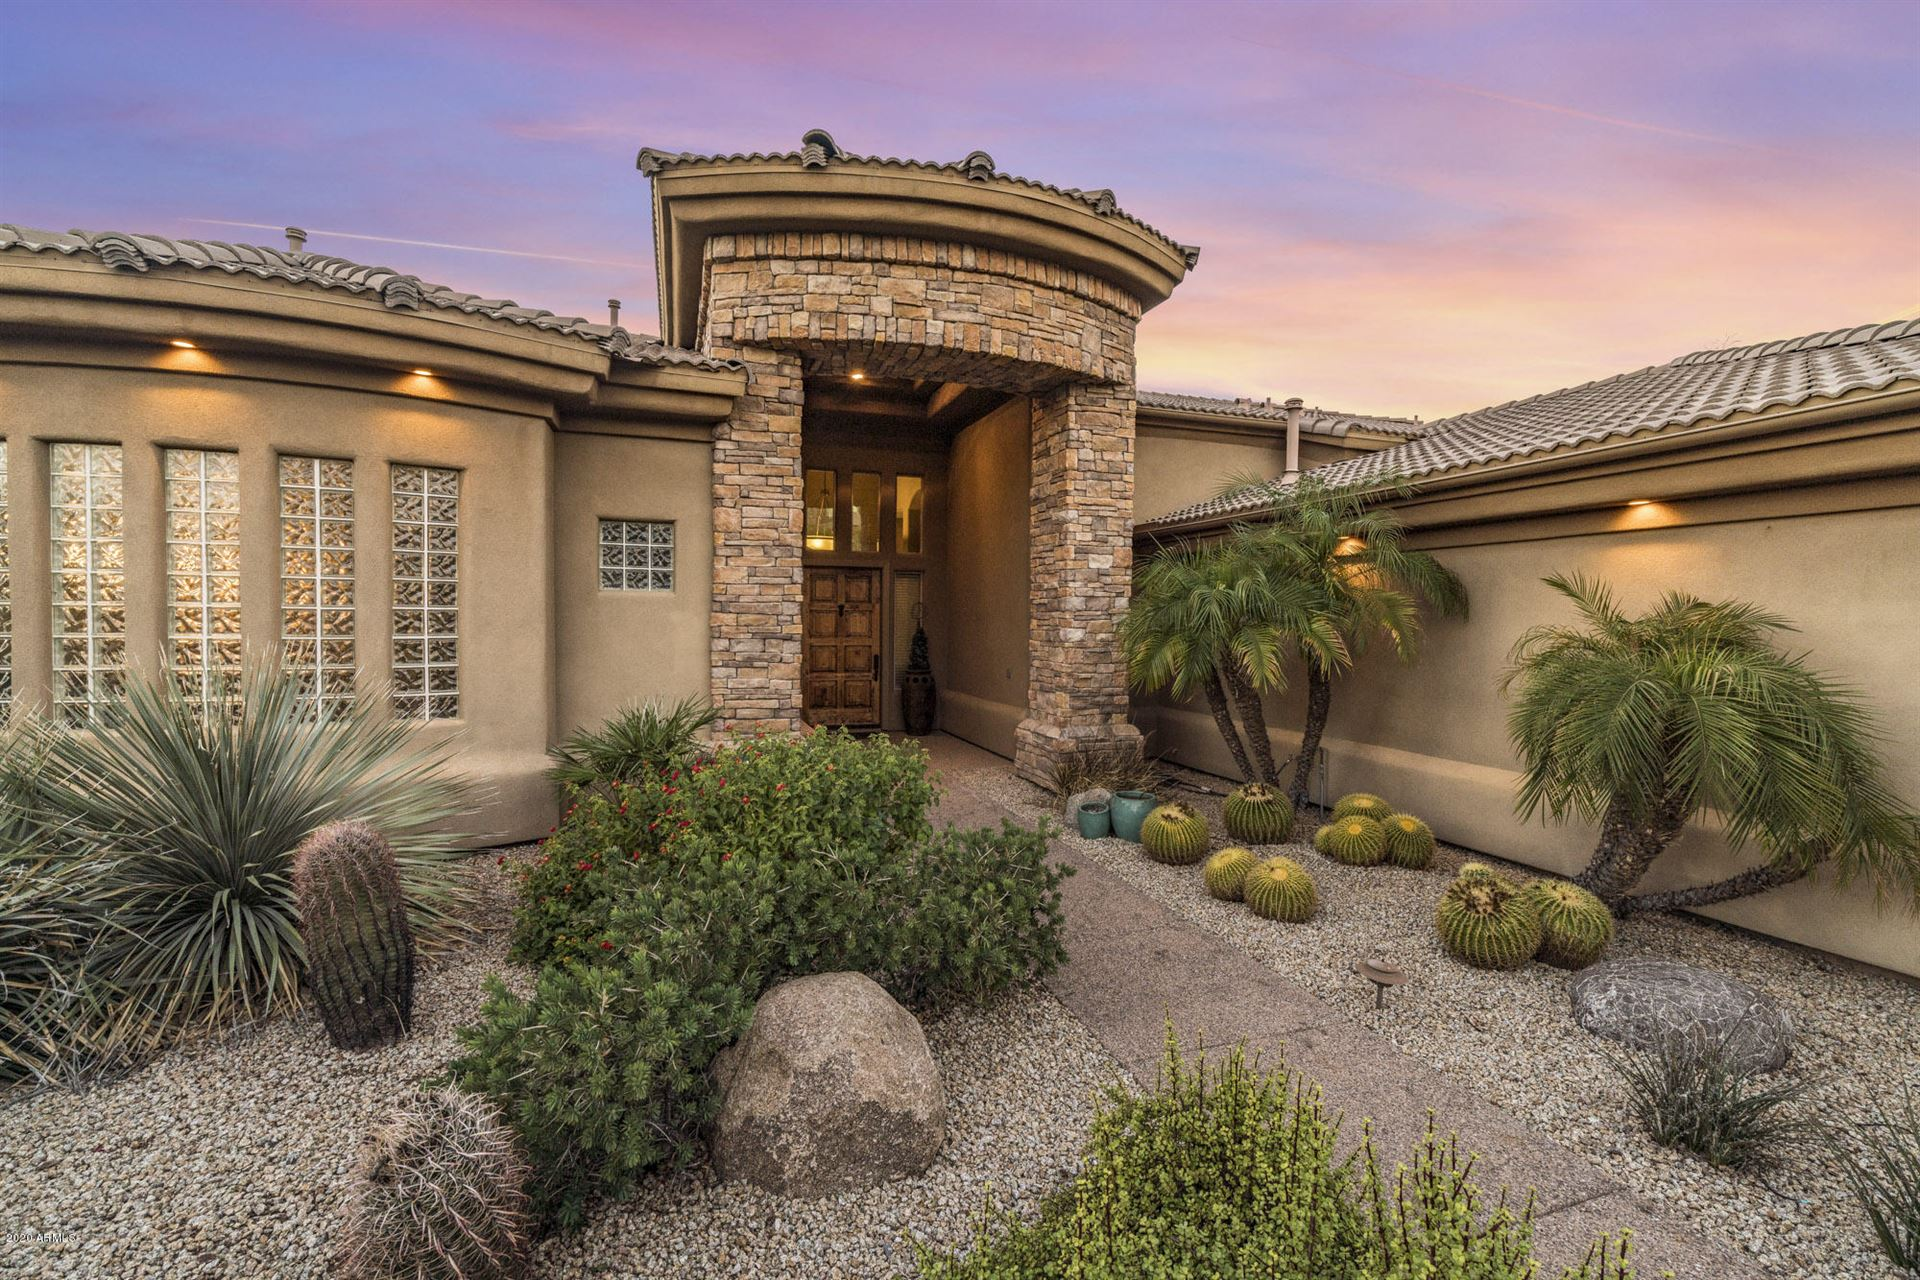 12654 N 17TH Place, Phoenix, AZ 85022 - MLS#: 6025682